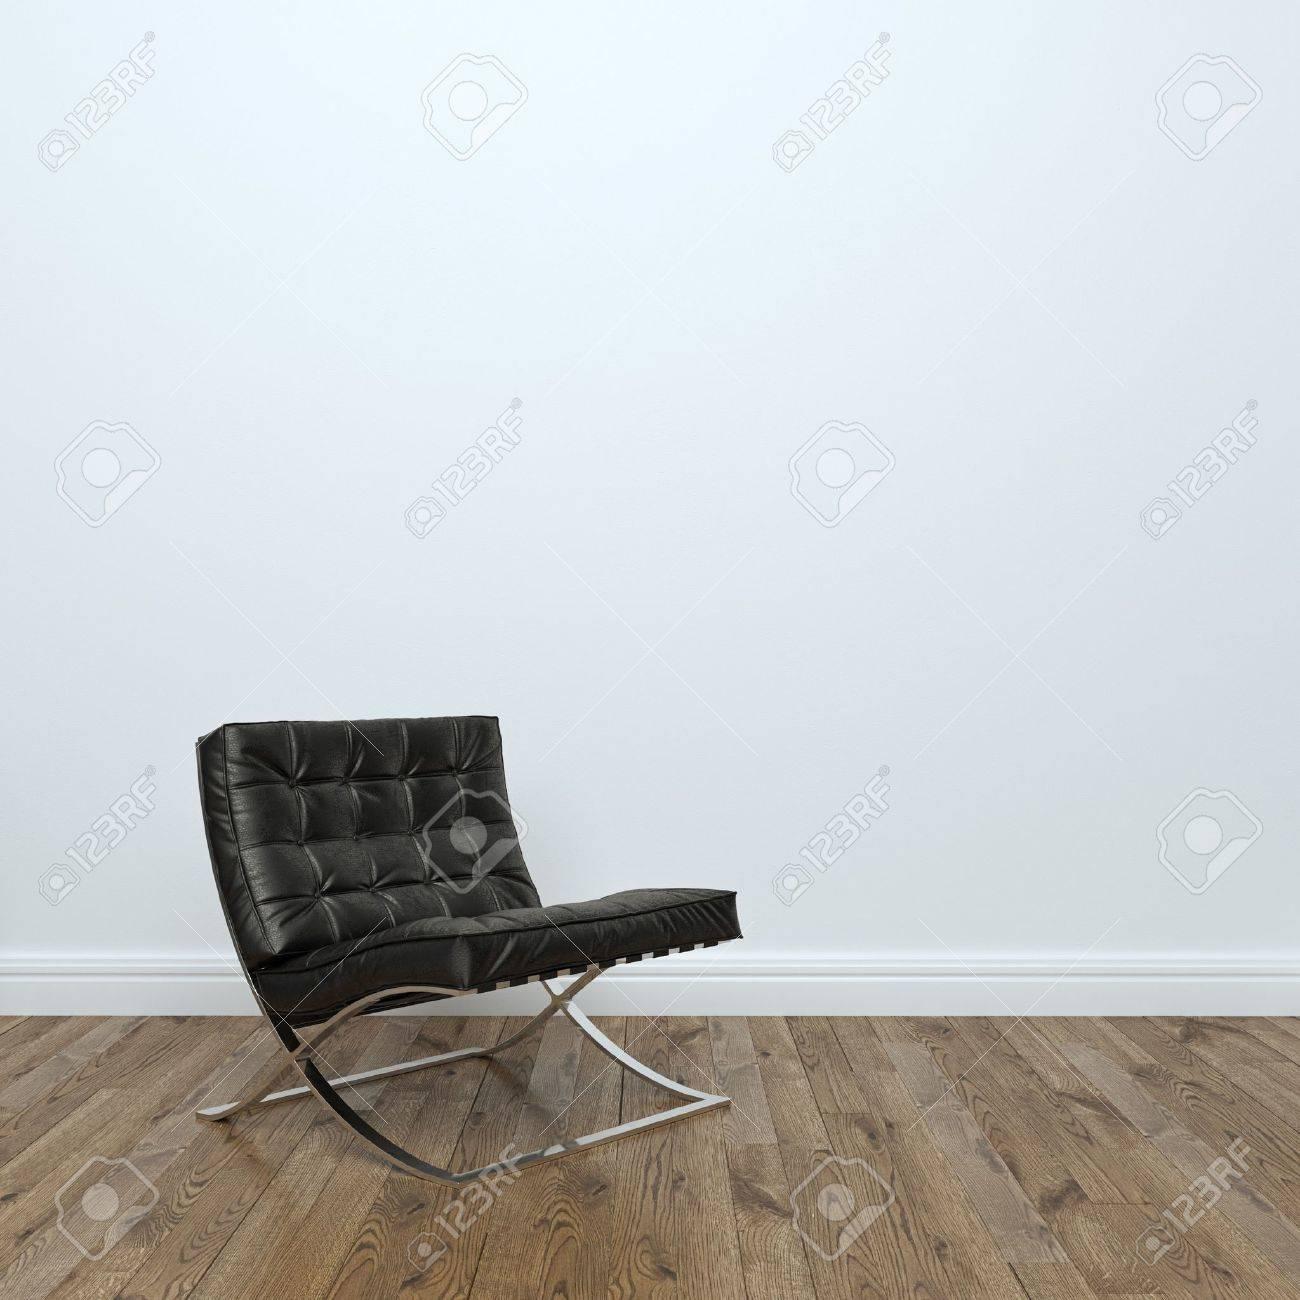 Black Leather Armchair In Empty Interior Room Stock Photo: - 35889719